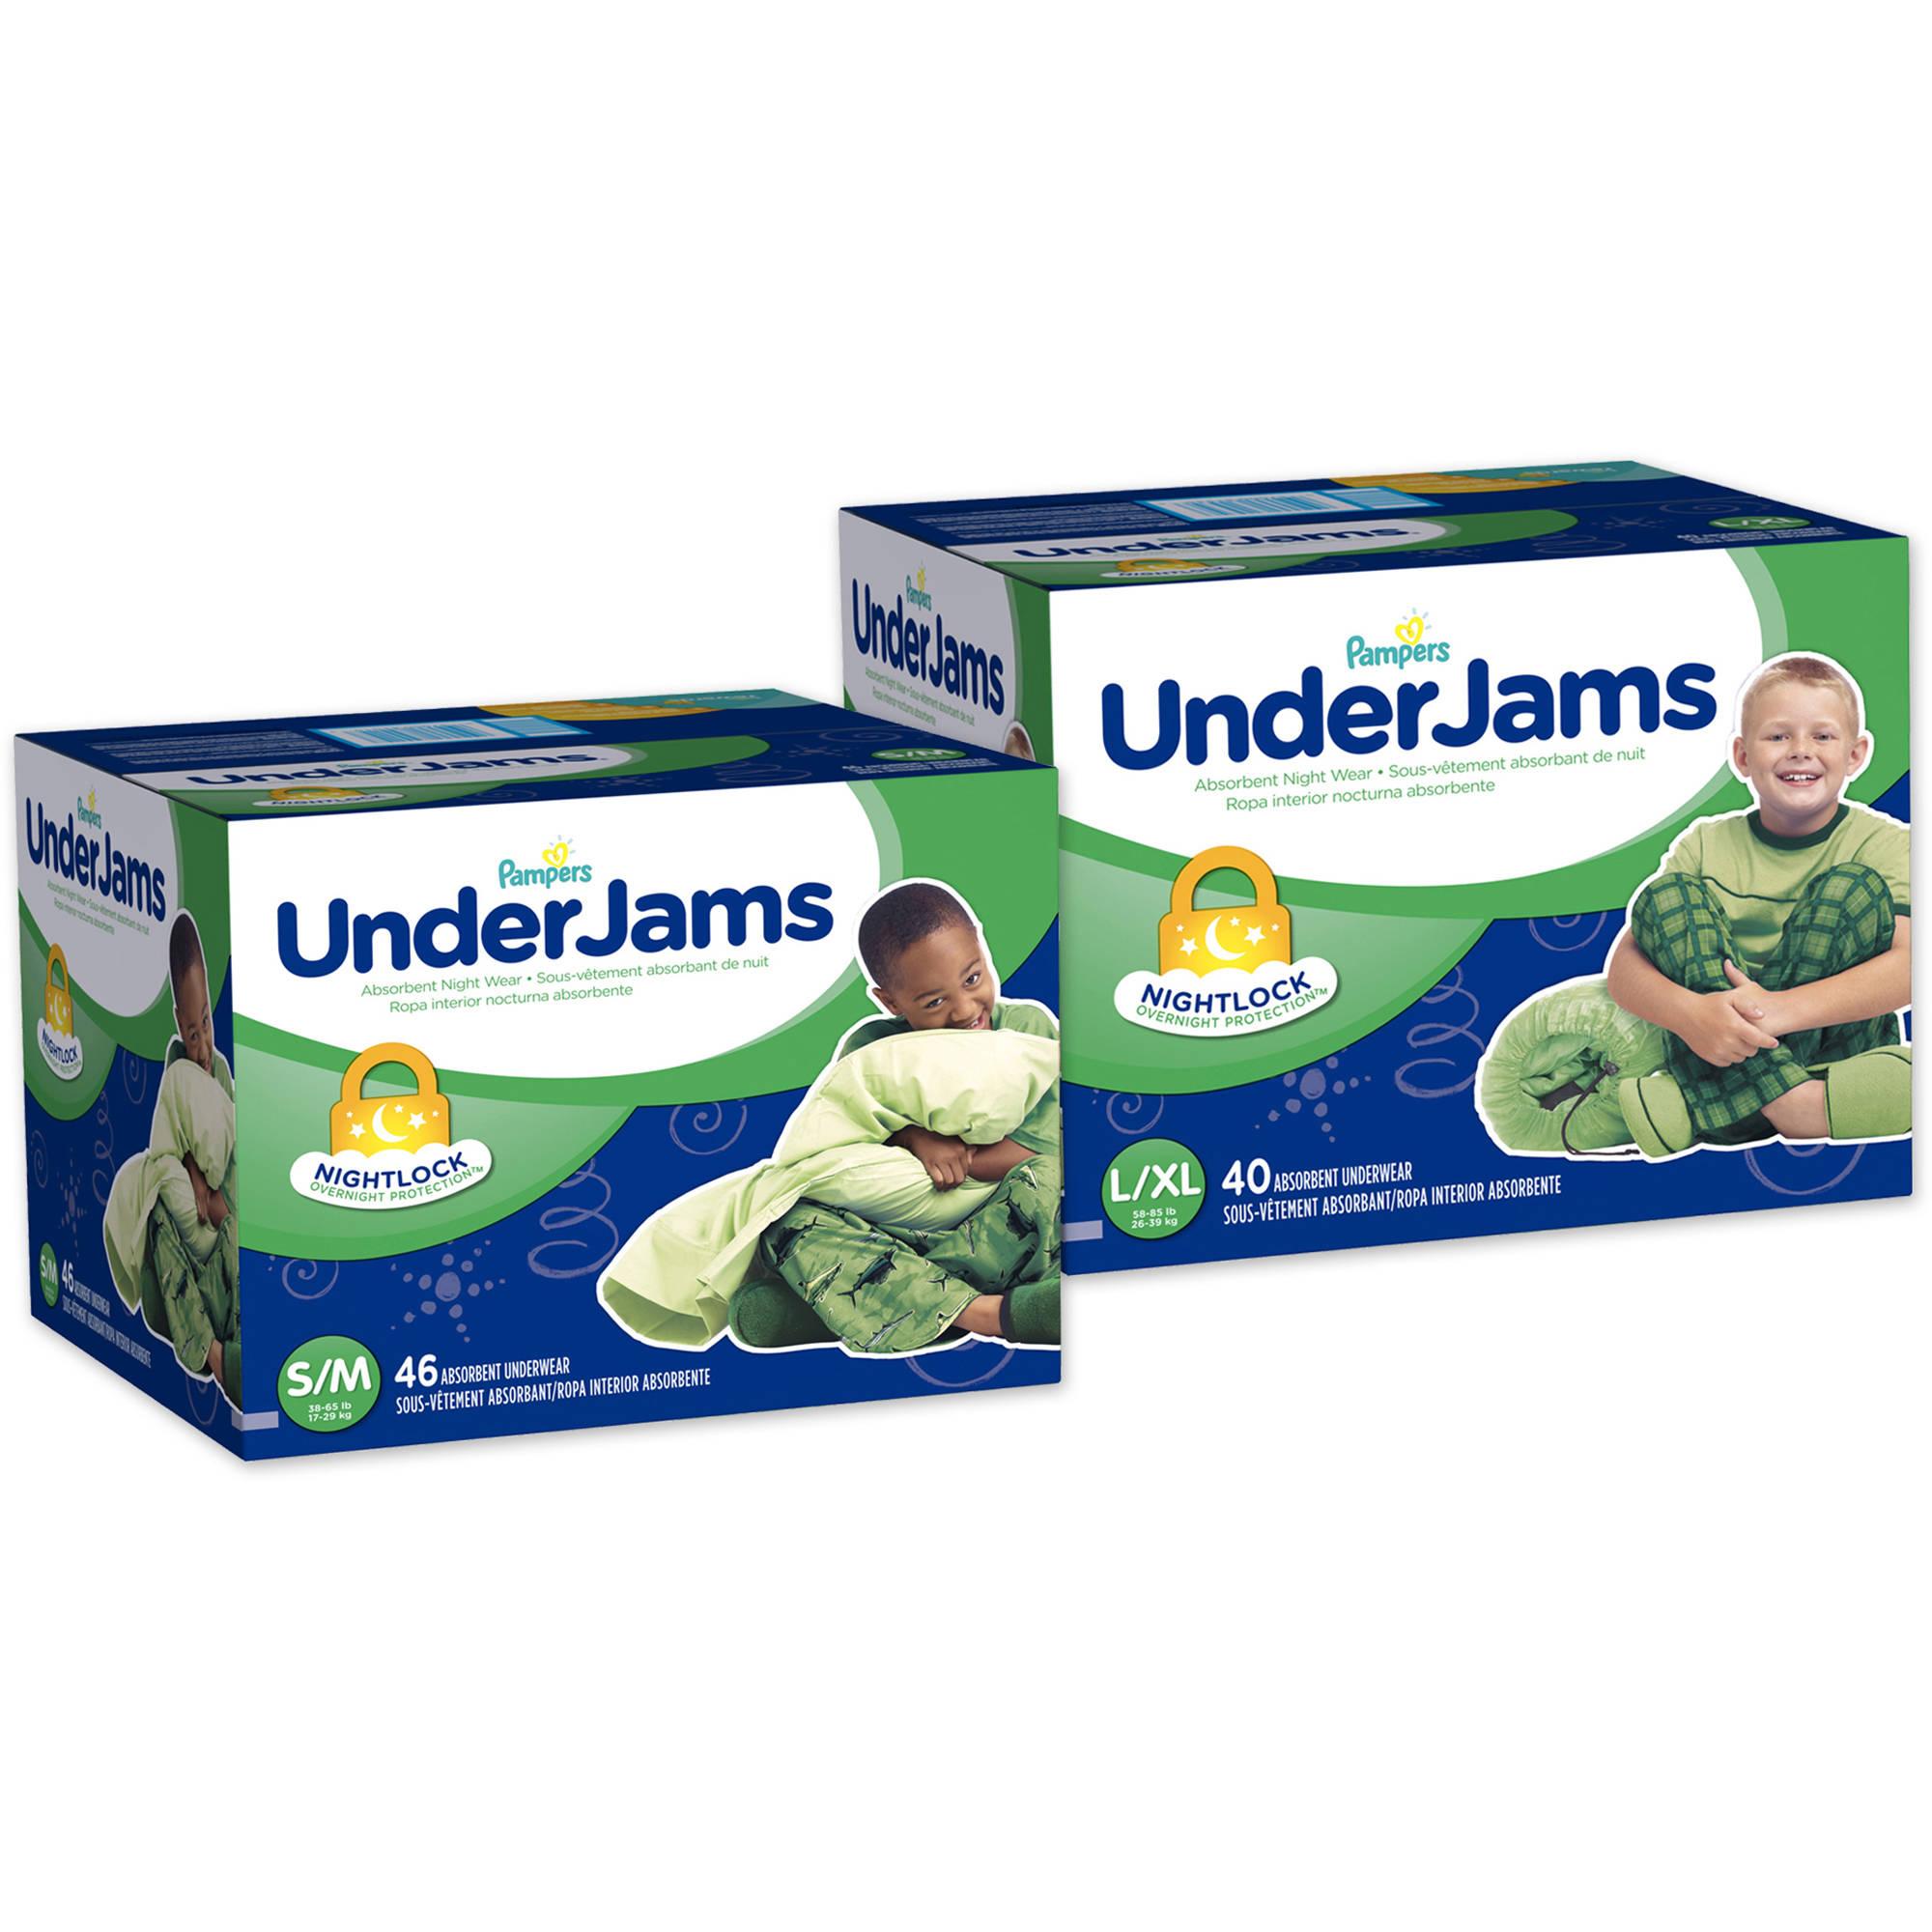 Pampers Boys' Underjams Absorbent Underwear, Big Pack (Choose Your Size)